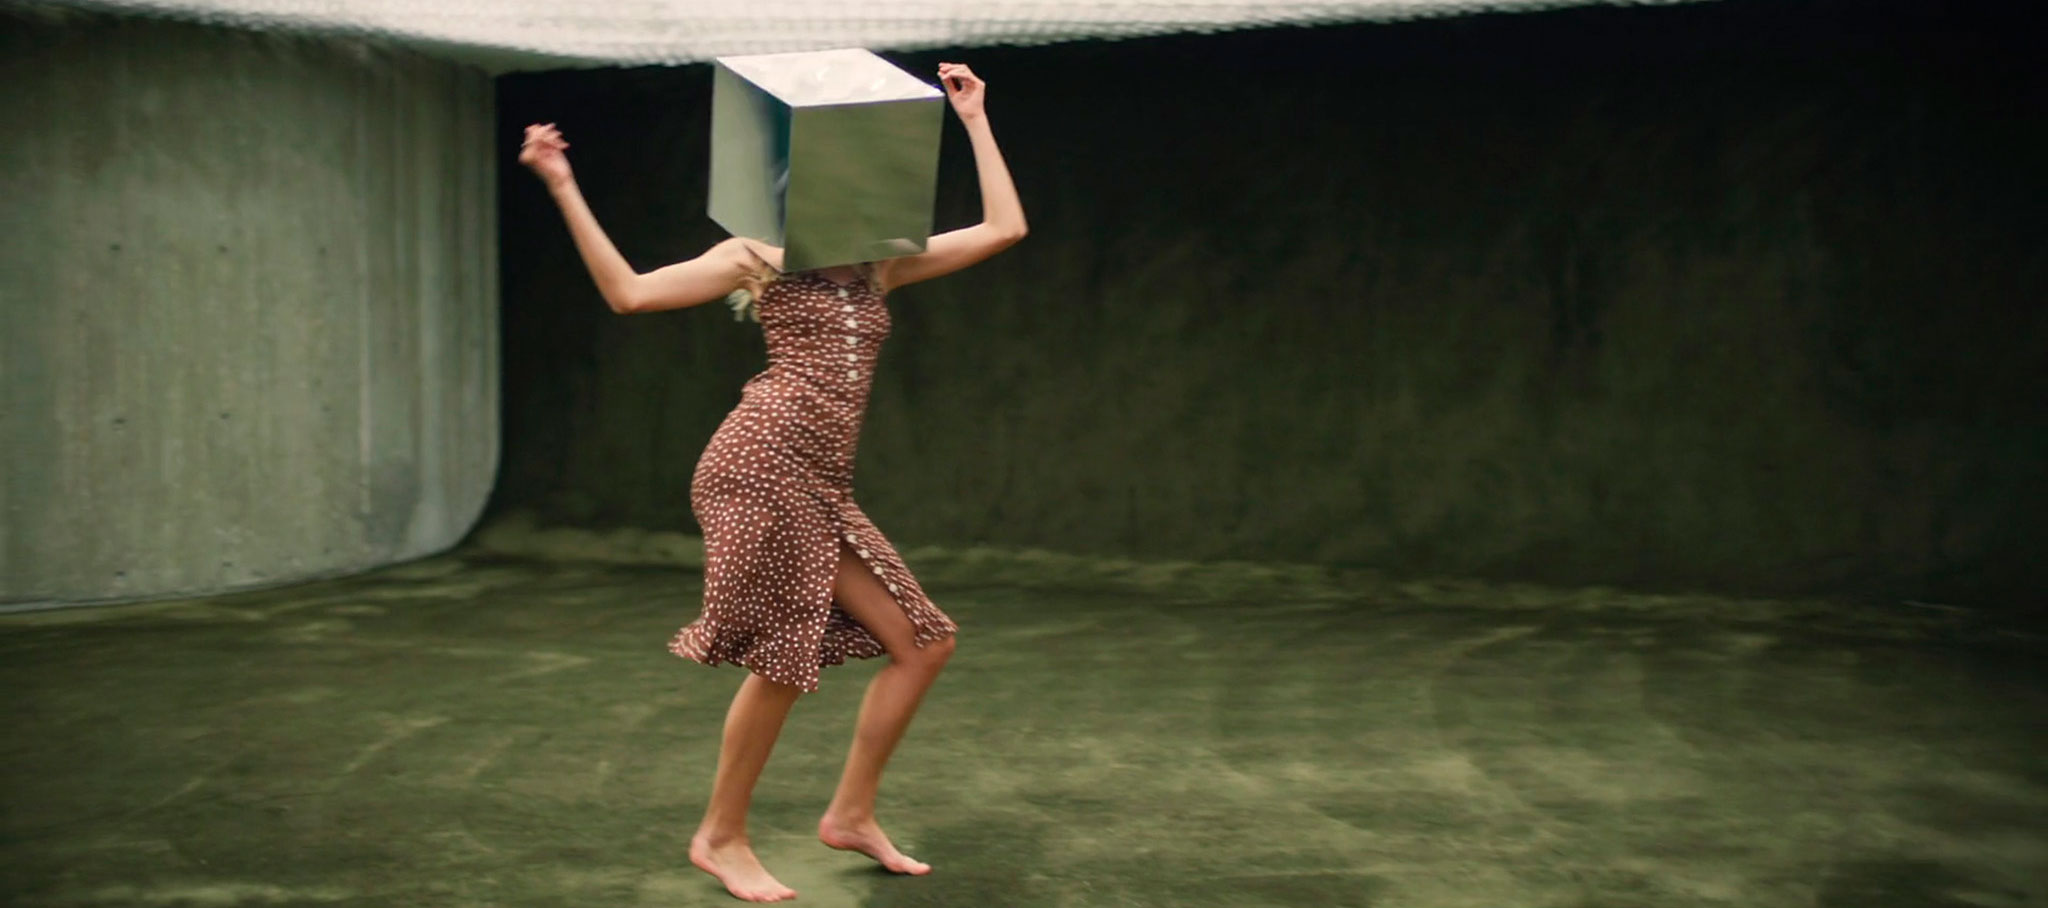 'JALOUSIE' por Angèle